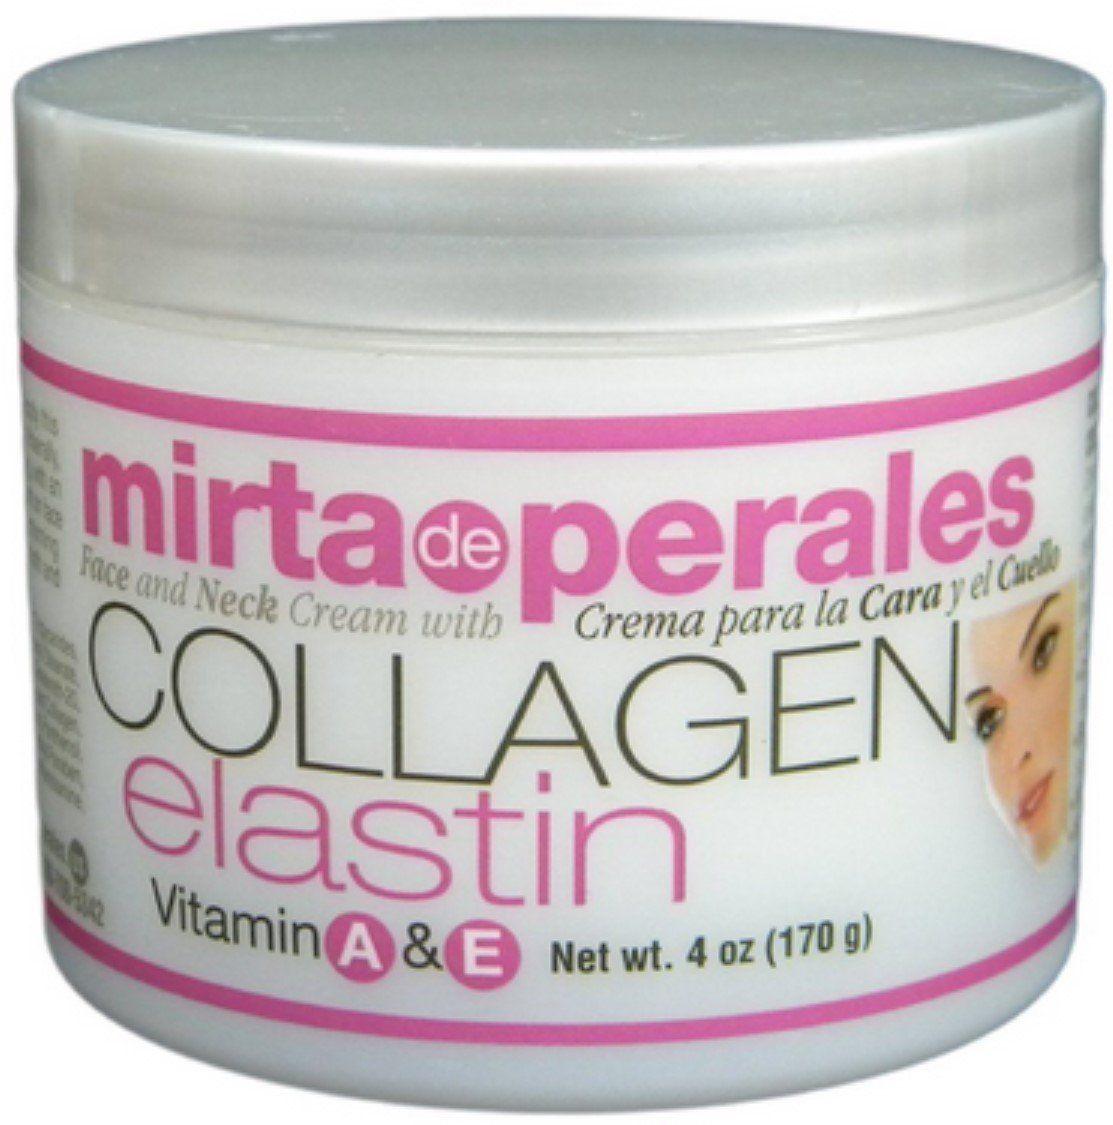 Mirta de Perales Collagen Elastin Cream, 4 oz (Pack of 3) ** For more information, visit image link.